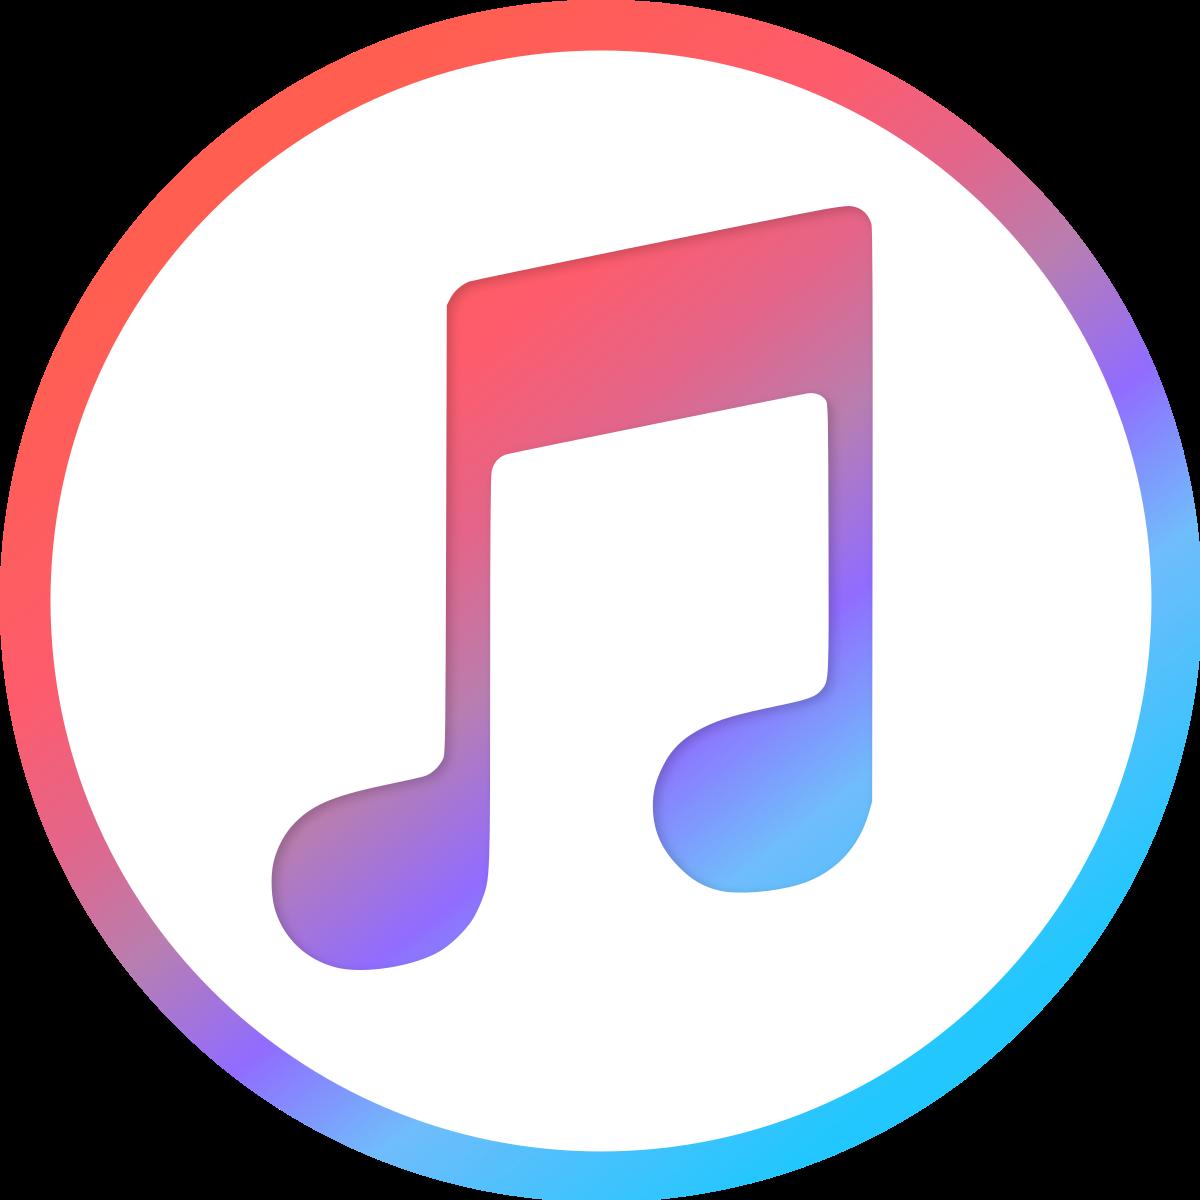 Iphone app clipart size transparent iTunes - Wikipedia transparent